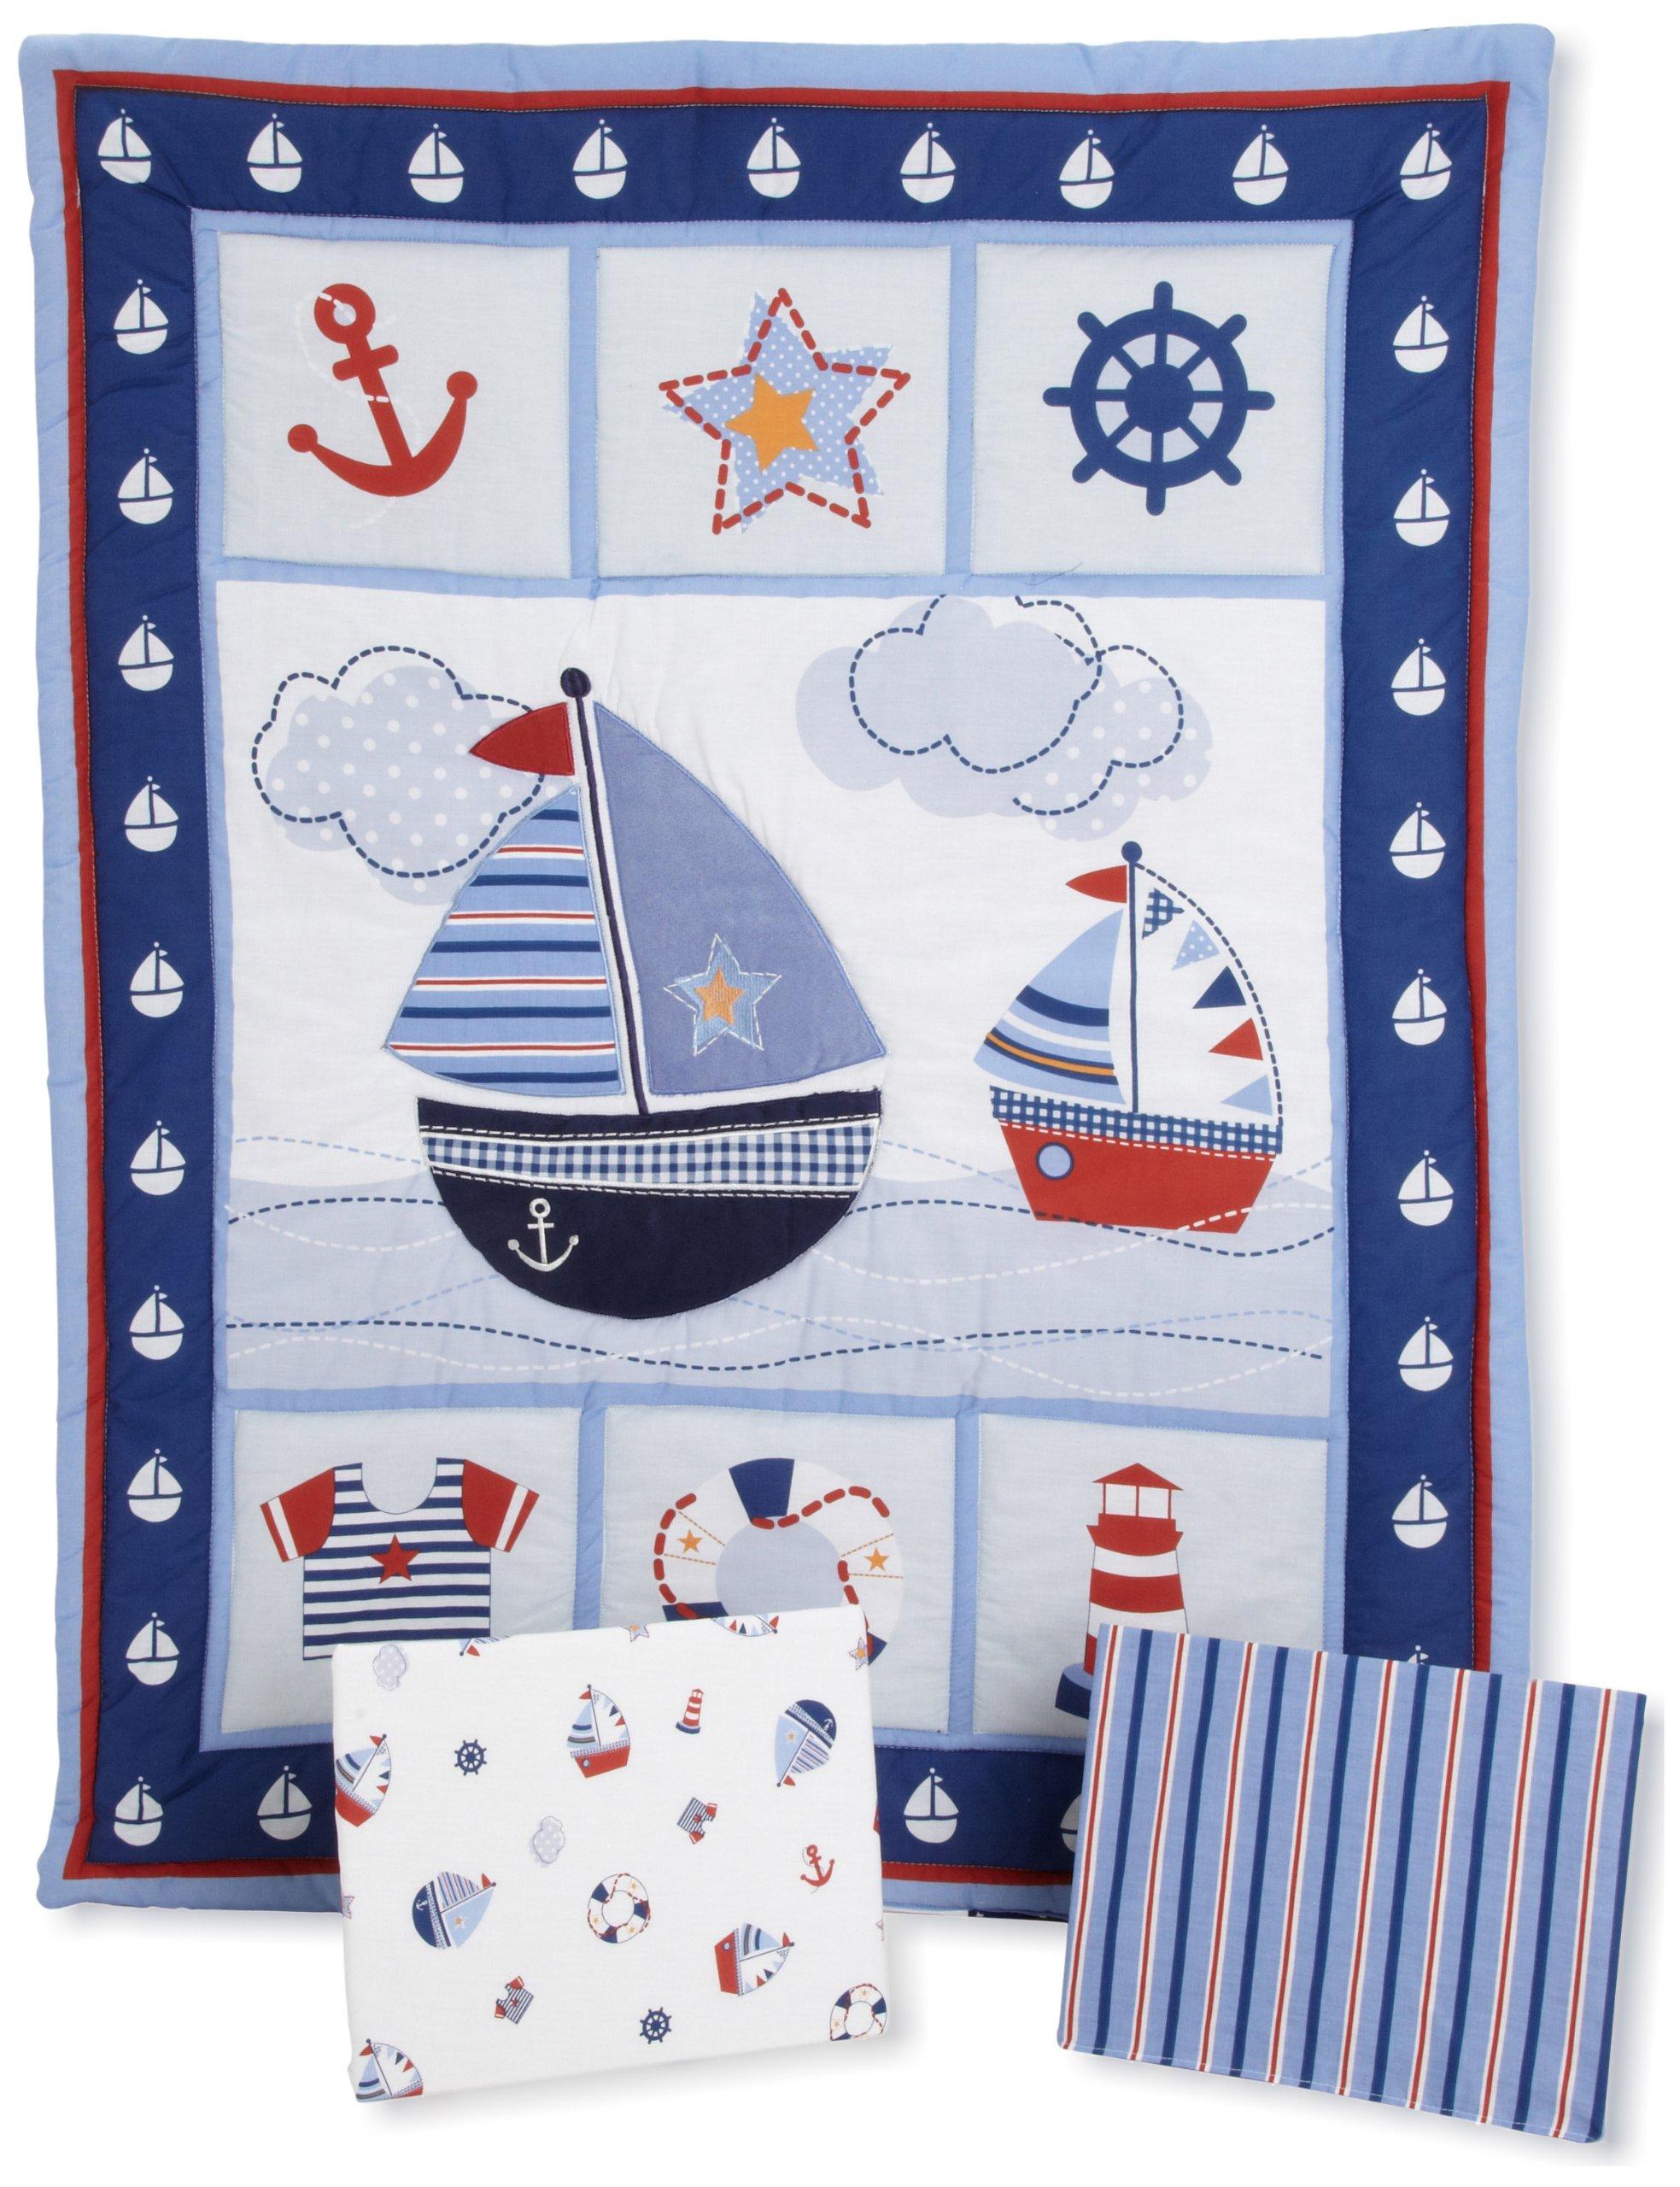 Bedtime Originals Sail Away 3 Piece Bedding Set, Blue